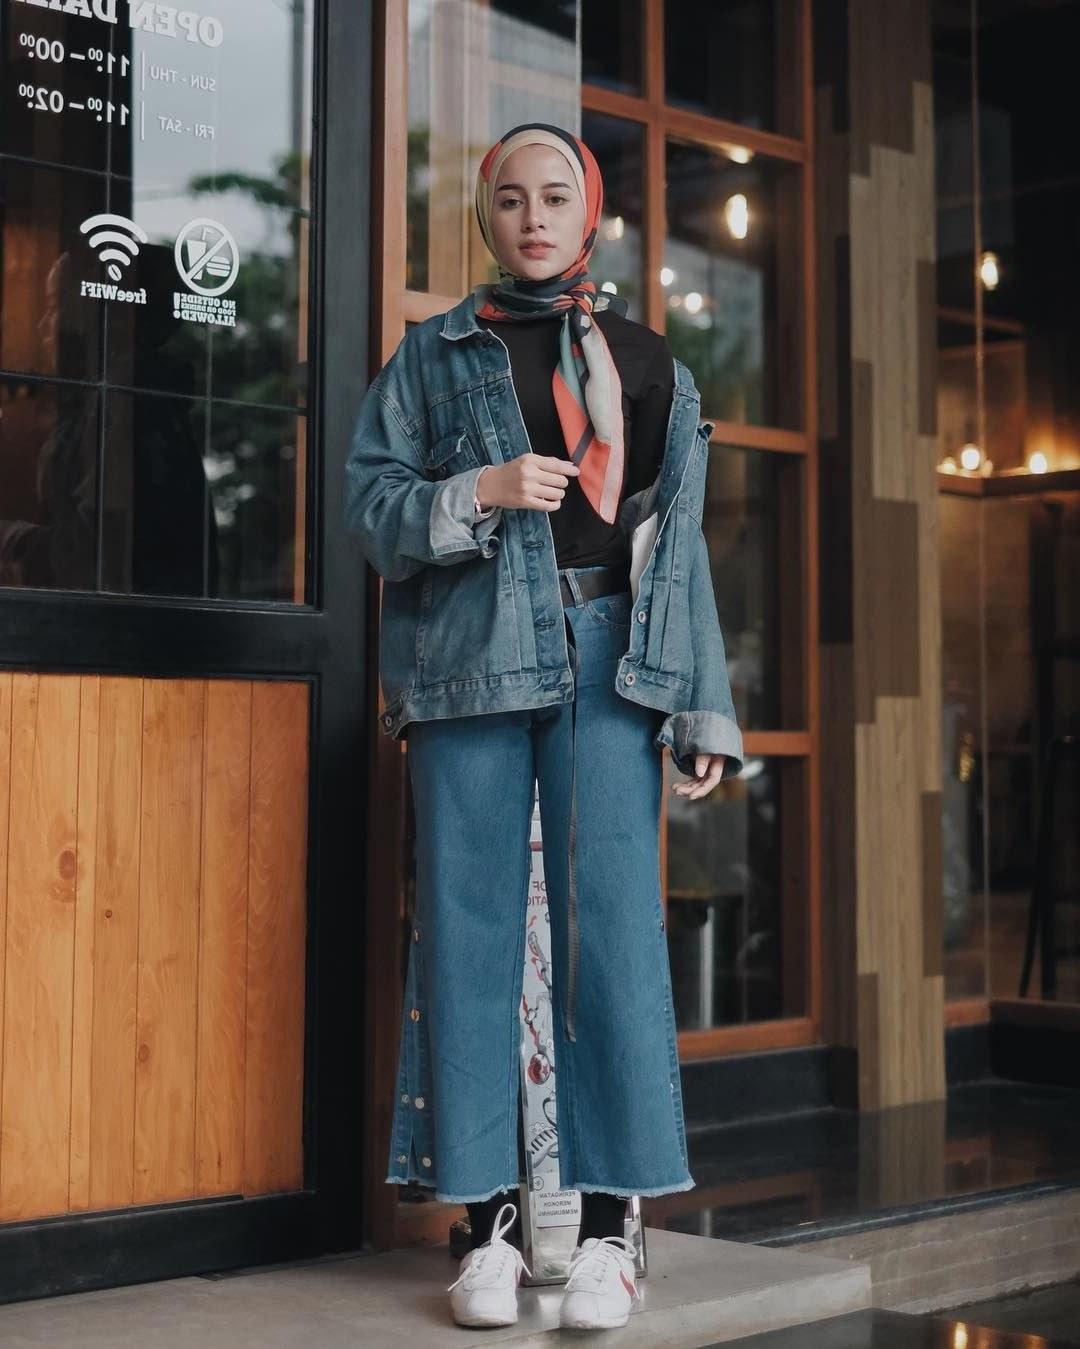 Ide Ootd Baju Lebaran Tqd3 Outfit Baju Remaja Berhijab Ala Selebgram 2018 Longpants